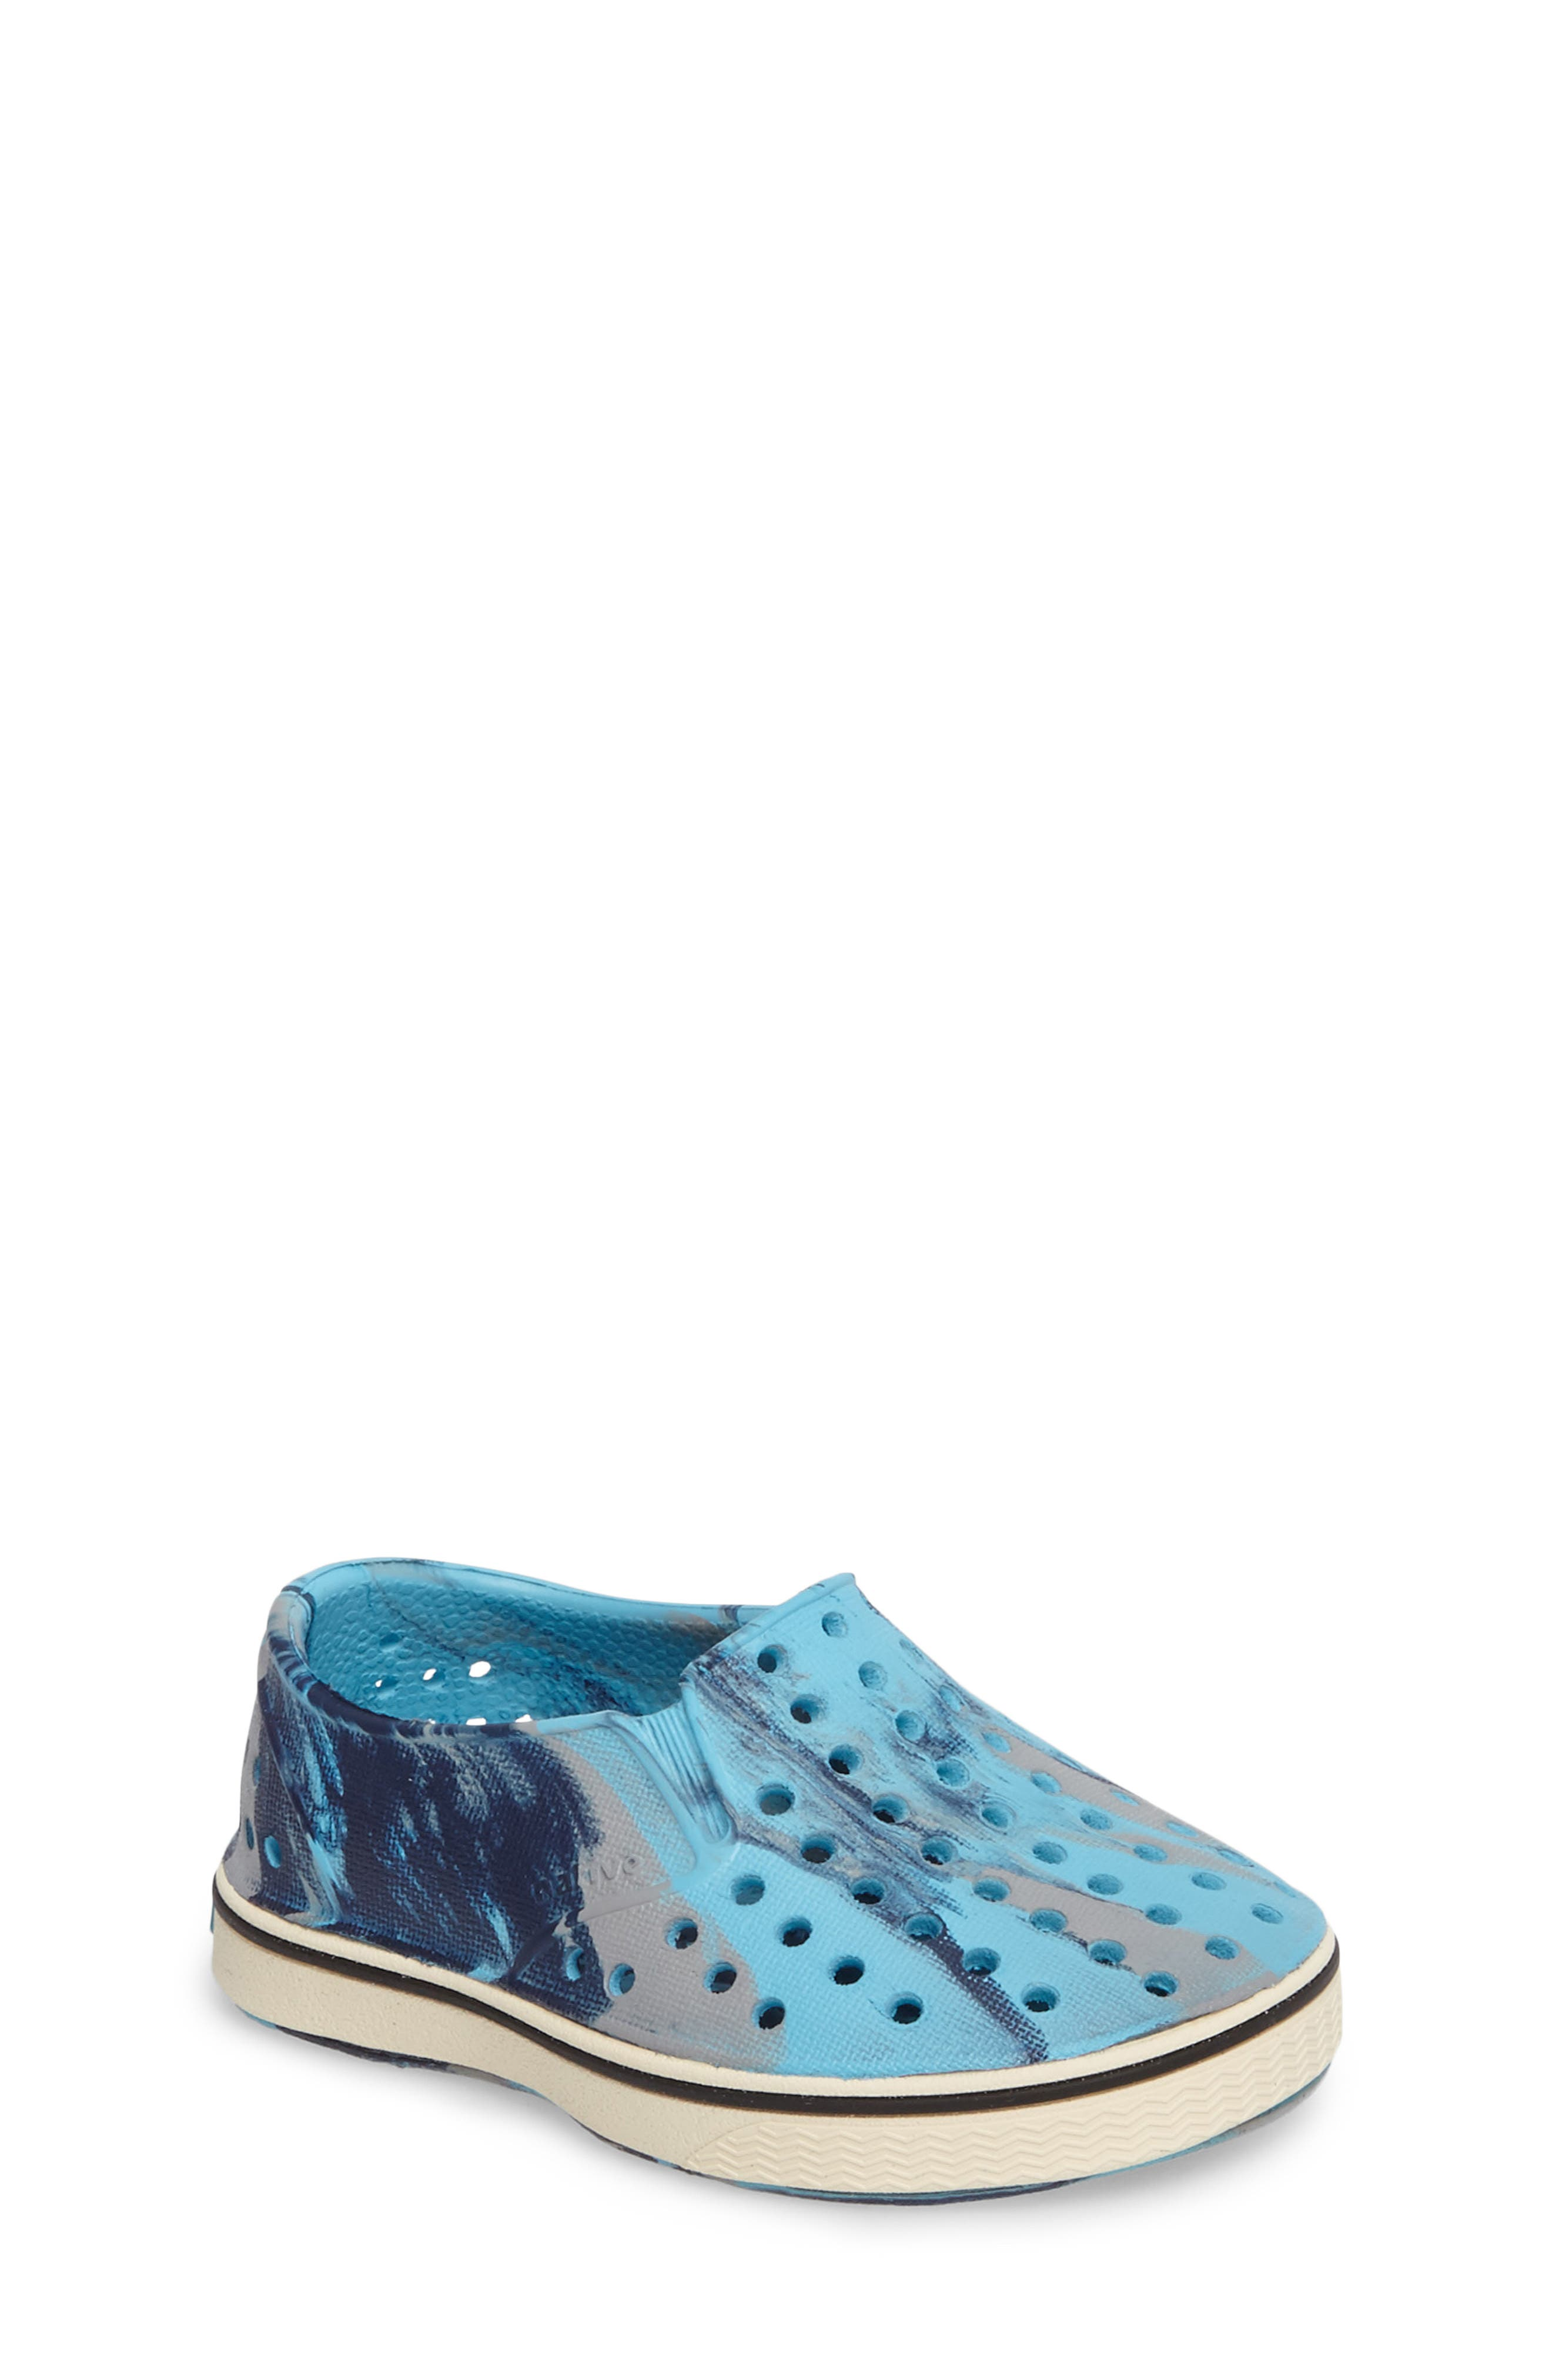 Main Image - Native Shoes Miles Marbled Slip-On Sneaker (Baby, Walker, Toddler, Little Kid & Big Kid)